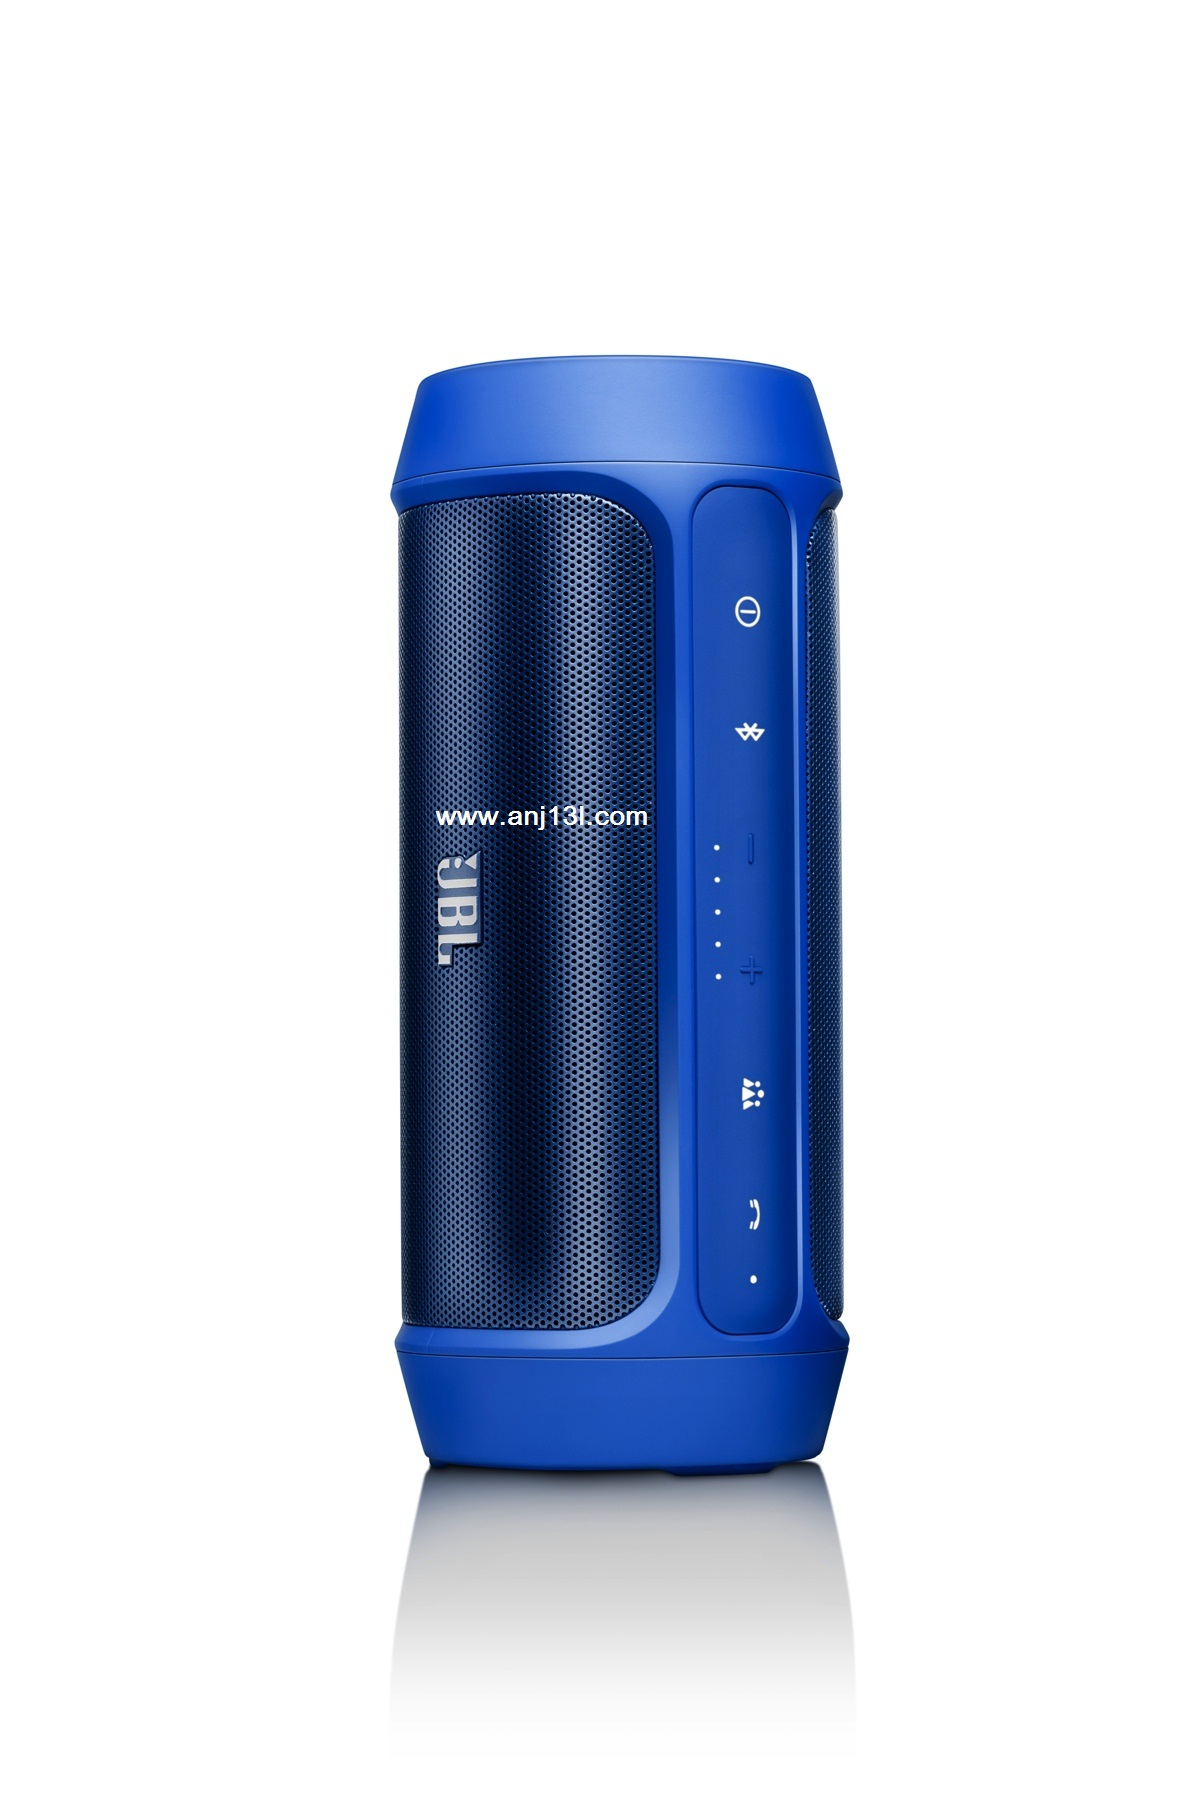 JBL Charge 2 BLUE มิติใหม่ที่คุณต้องสัมผัส มี 5 สี ลำโพงสเตอริโอแบบพกพาที่ให้เสียงที่ดีที่สุดด้วยกำลังวัตต์ 15 WATTS